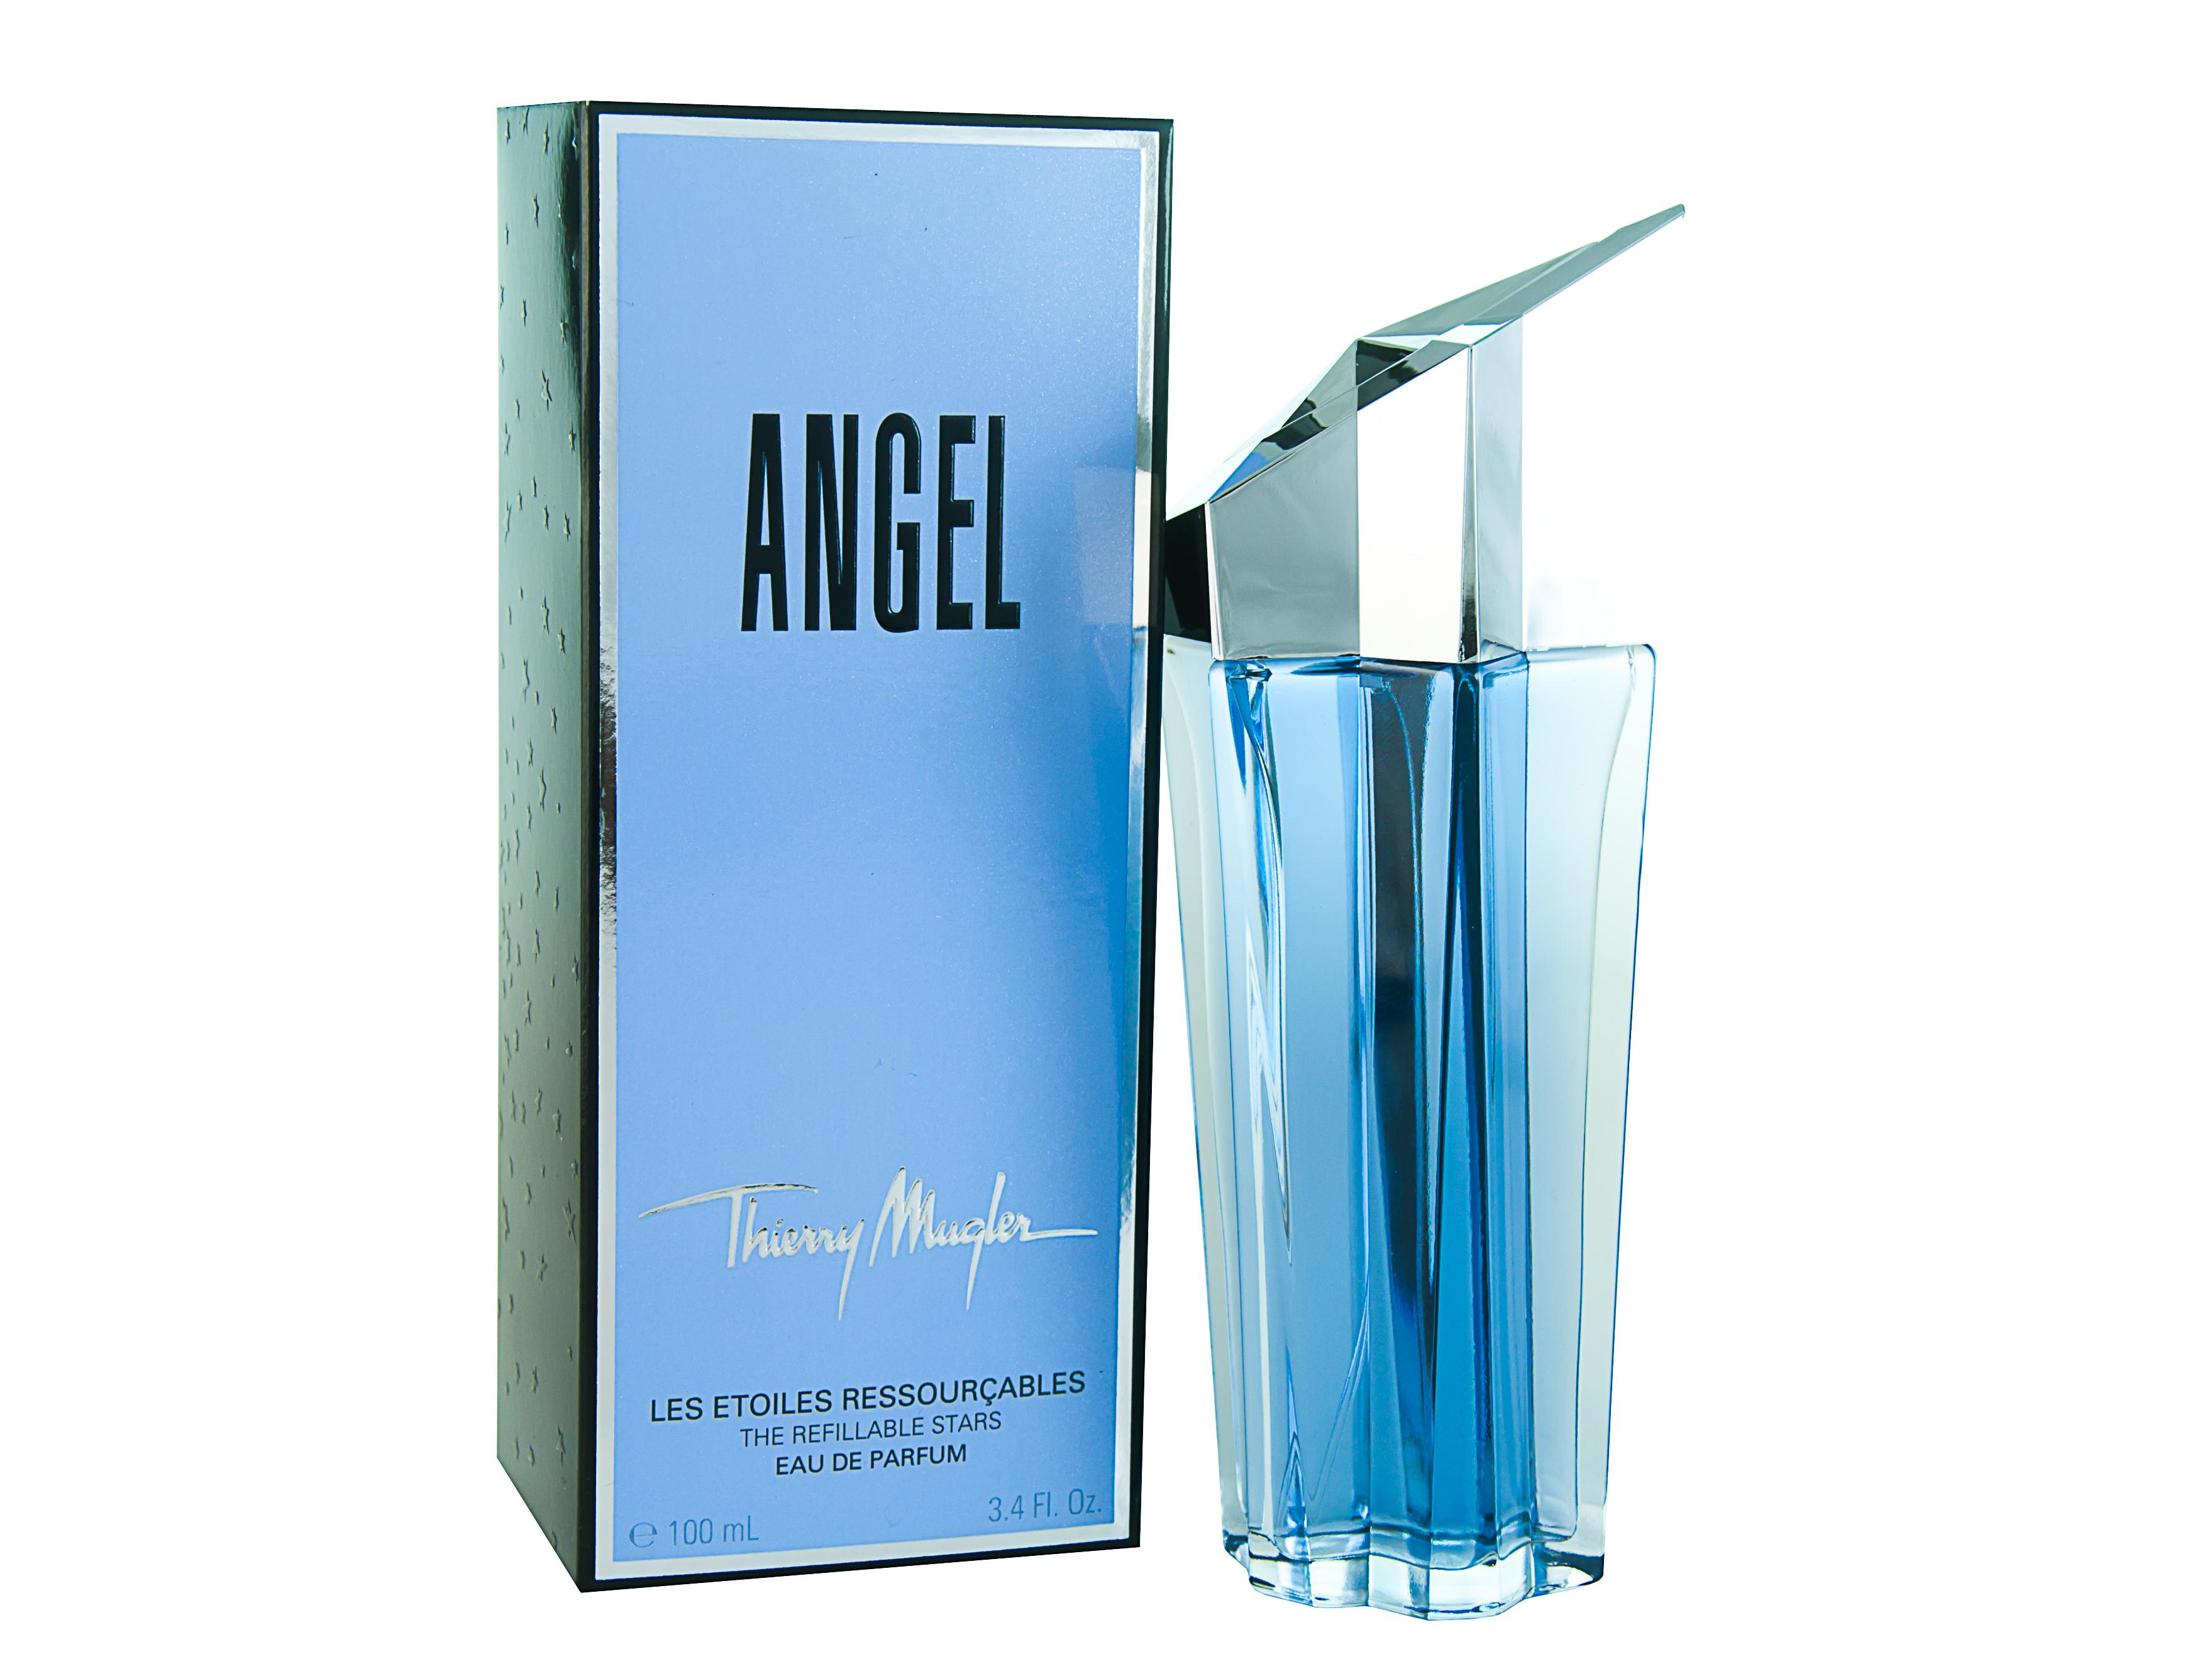 thierry mugler angel eau de parfum 100ml refill ebay. Black Bedroom Furniture Sets. Home Design Ideas